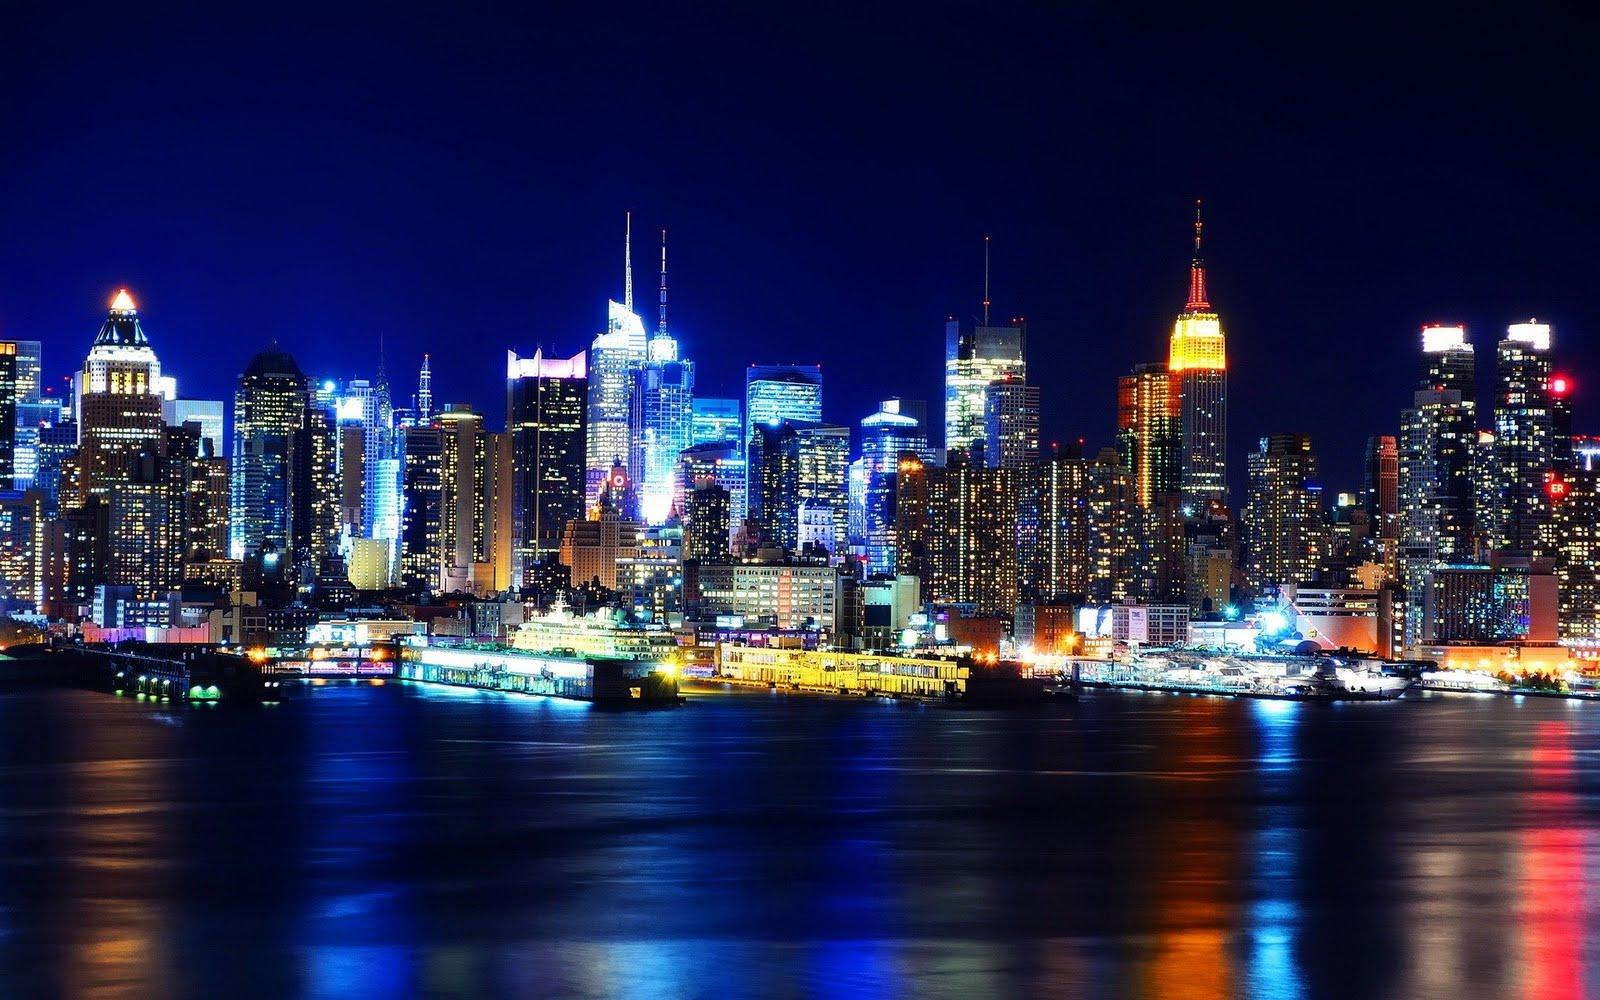 new york night wallpaper new york wallpaper new york wallpaper 1600x1000